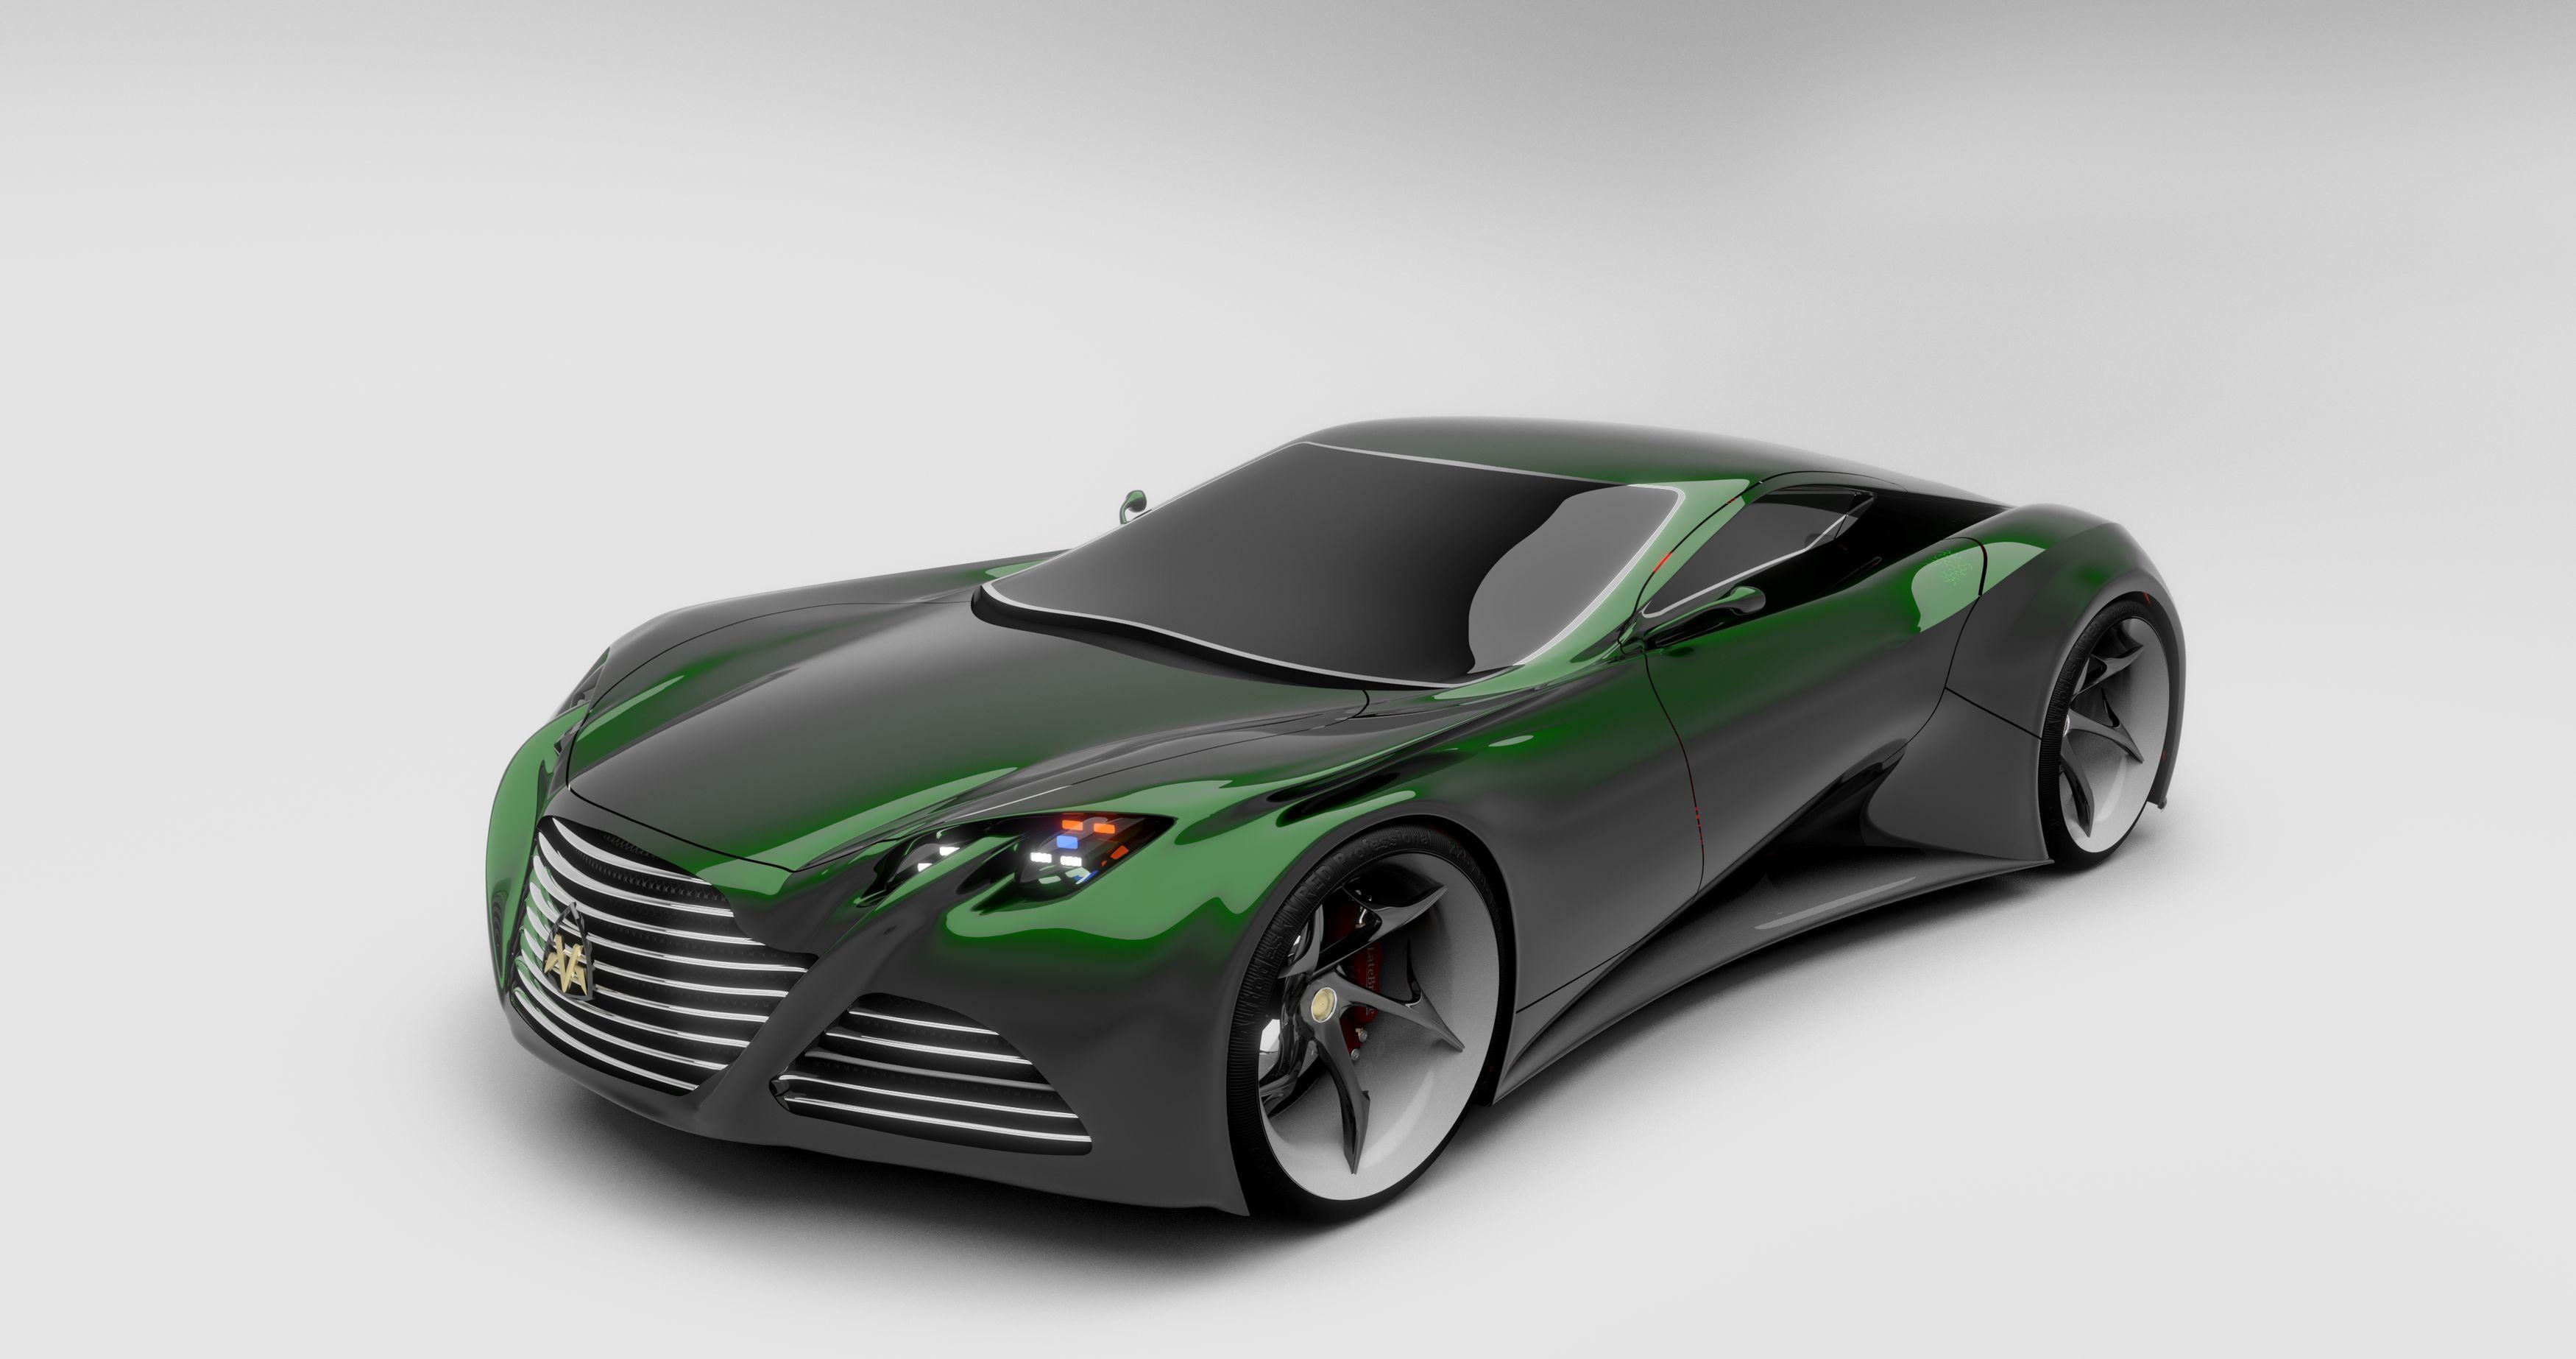 Aston-martin-db-next-x-1-3500-3500